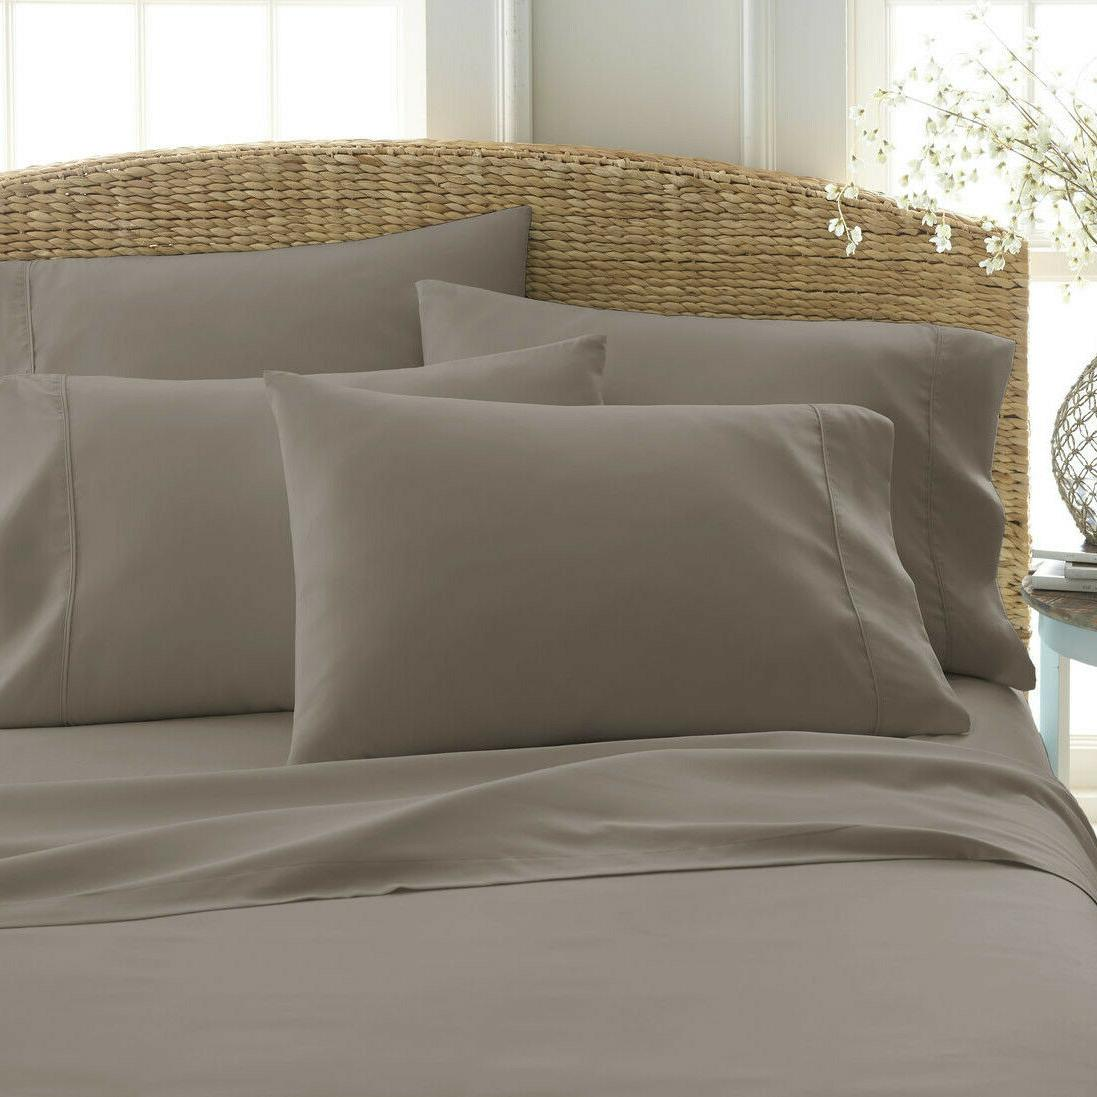 6 2100 Egyptian Comfort Sheet Set